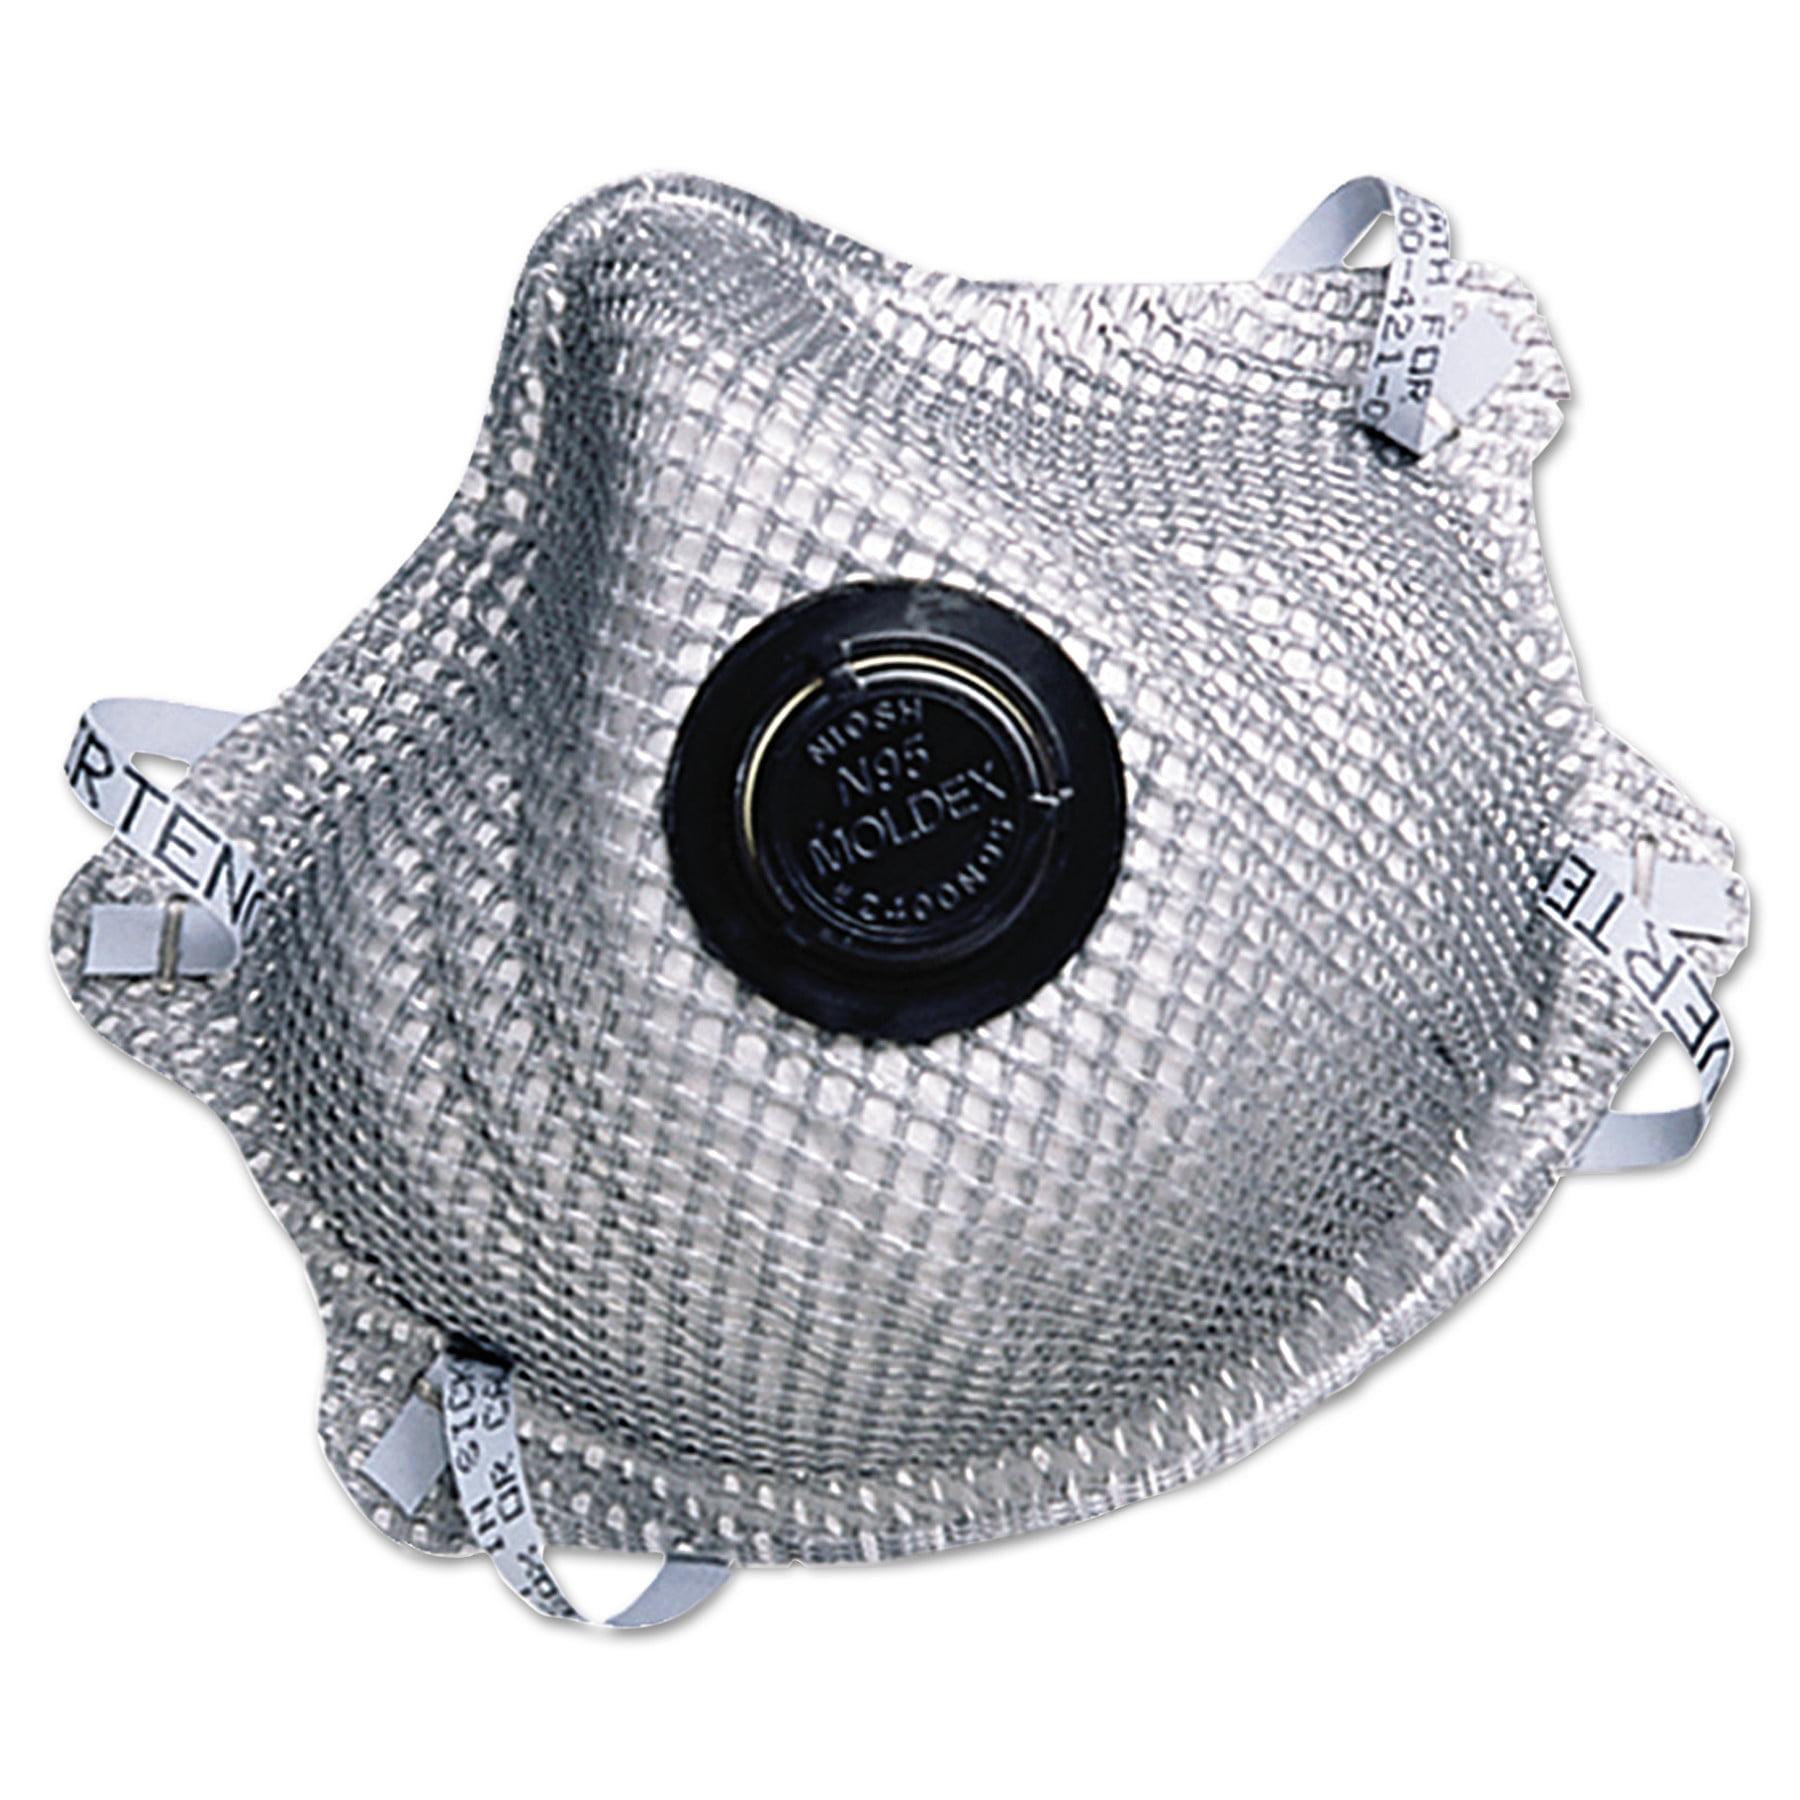 Moldex 2400N95 Series Particulate Respirator, Half-Face Mask, Medium Large, 10 Box by MOLDEX-METRIC, INC.